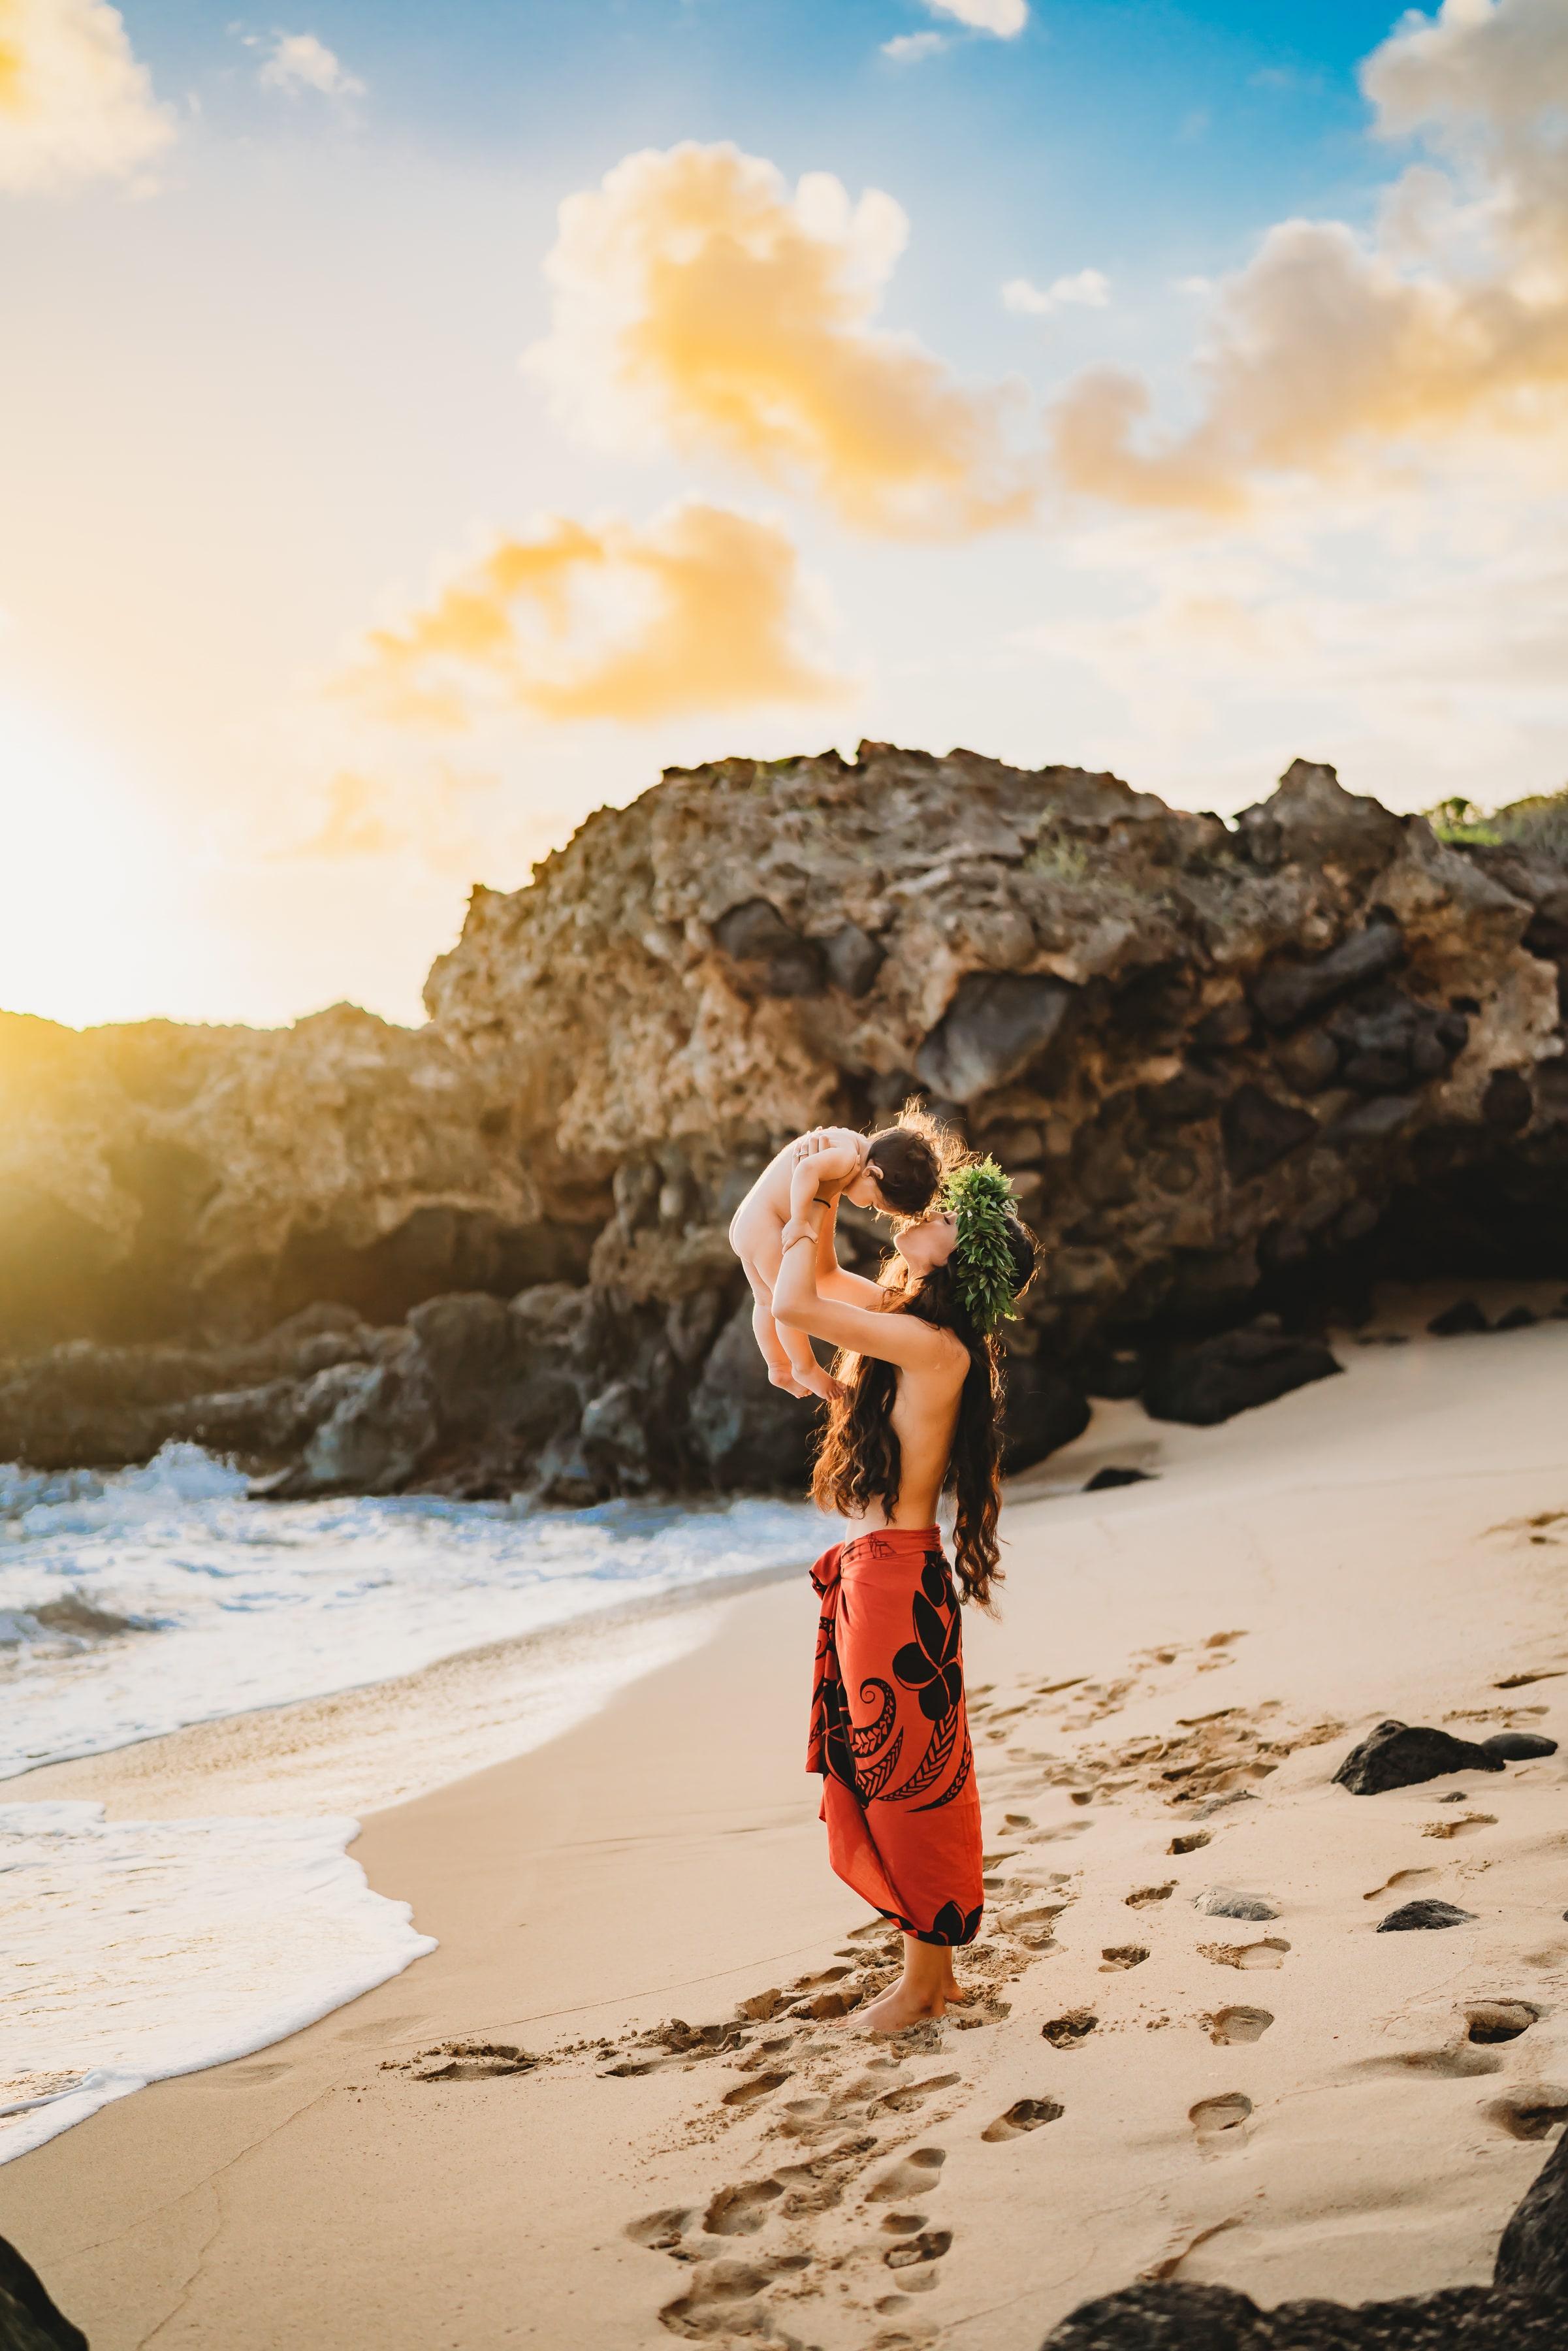 Oahu-Hawaii-Family-Photographer-haku-lei-mother-daughter-beach-session-1.jpg